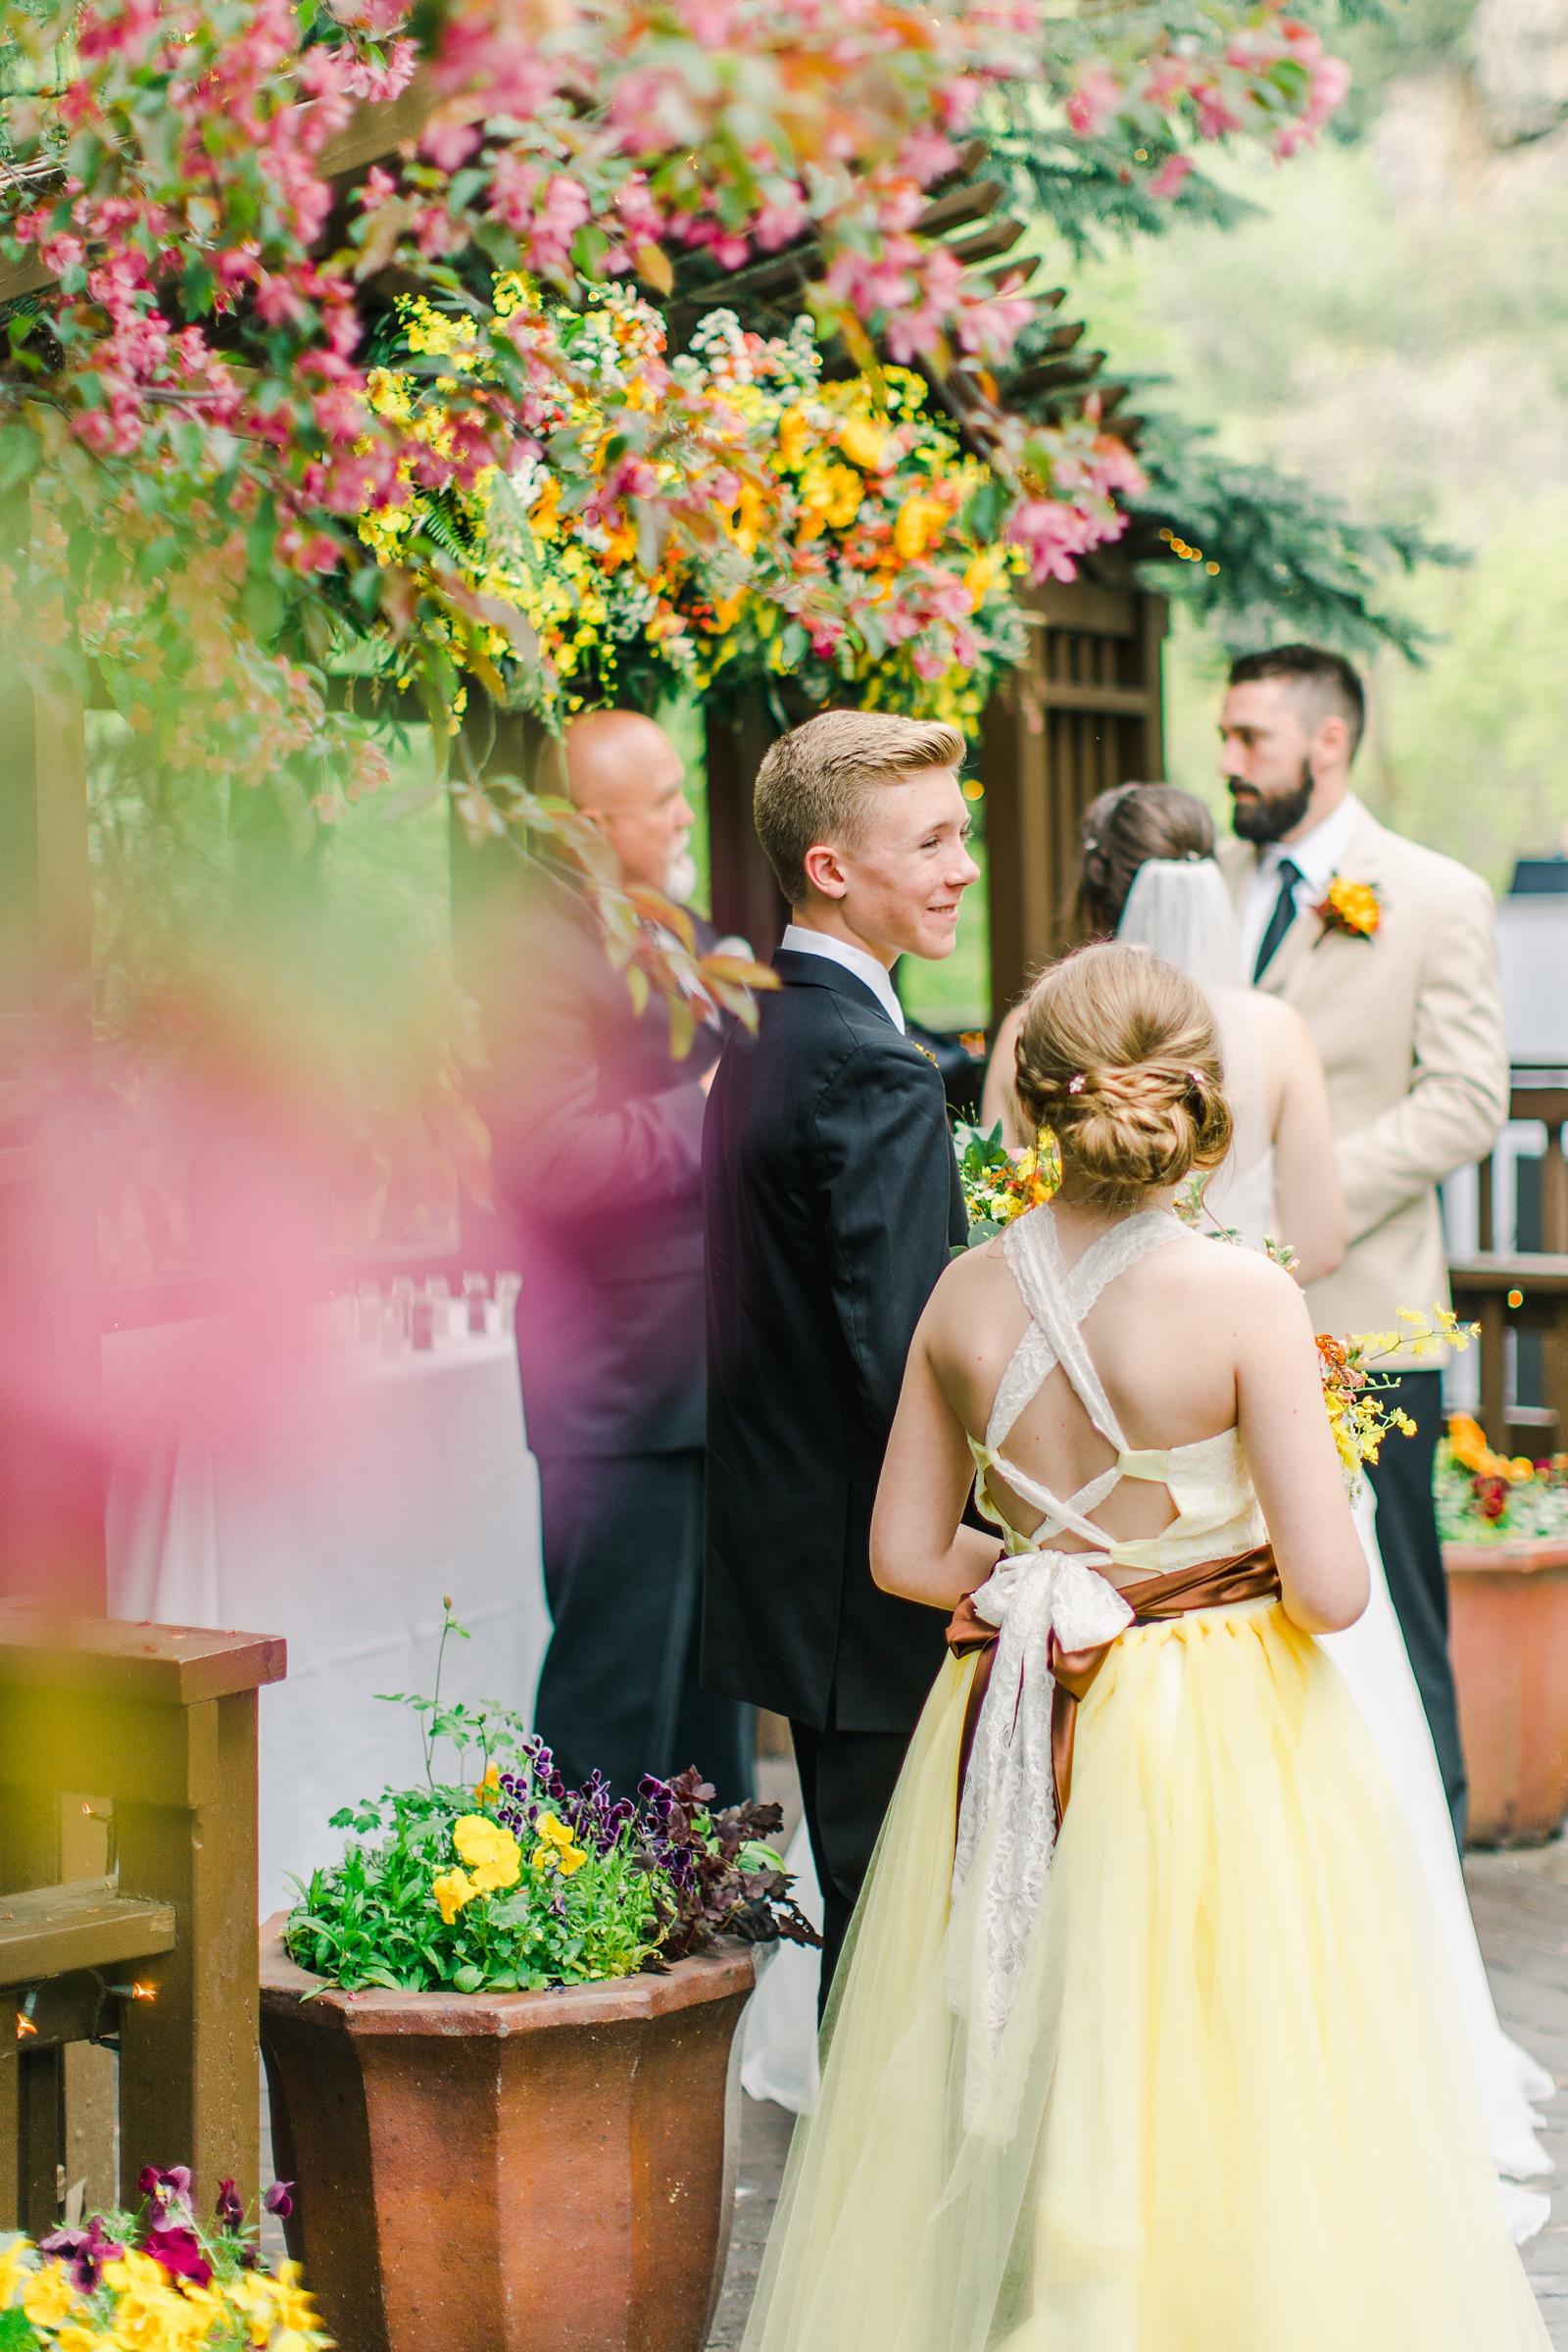 Millcreek Inn Summer Wedding, Utah wedding photography Millcreek Canyon, Salt Lake City, mountain ceremony